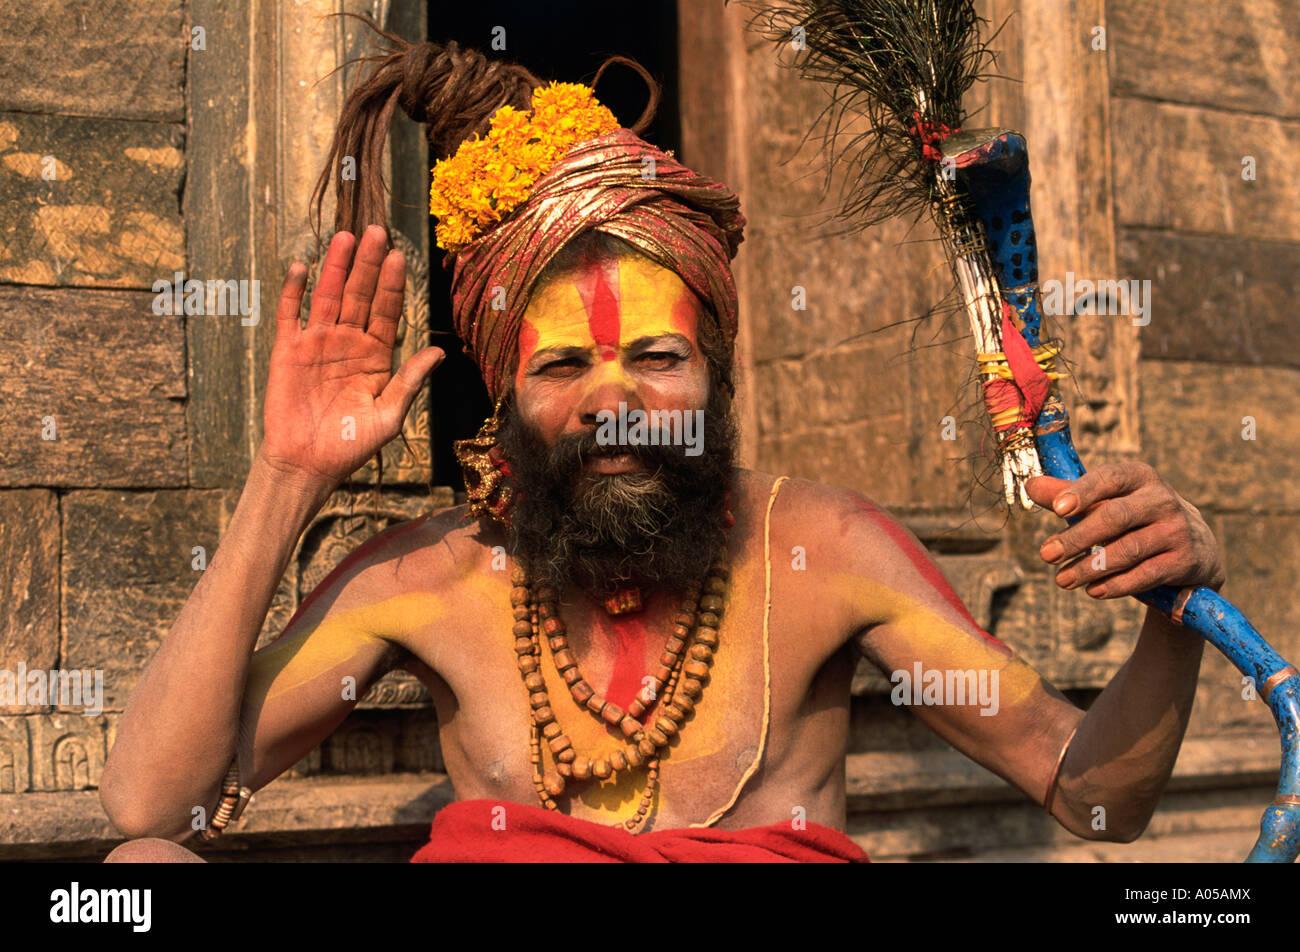 Kathmandu, Holyman, Sadhu, Day - Stock Image